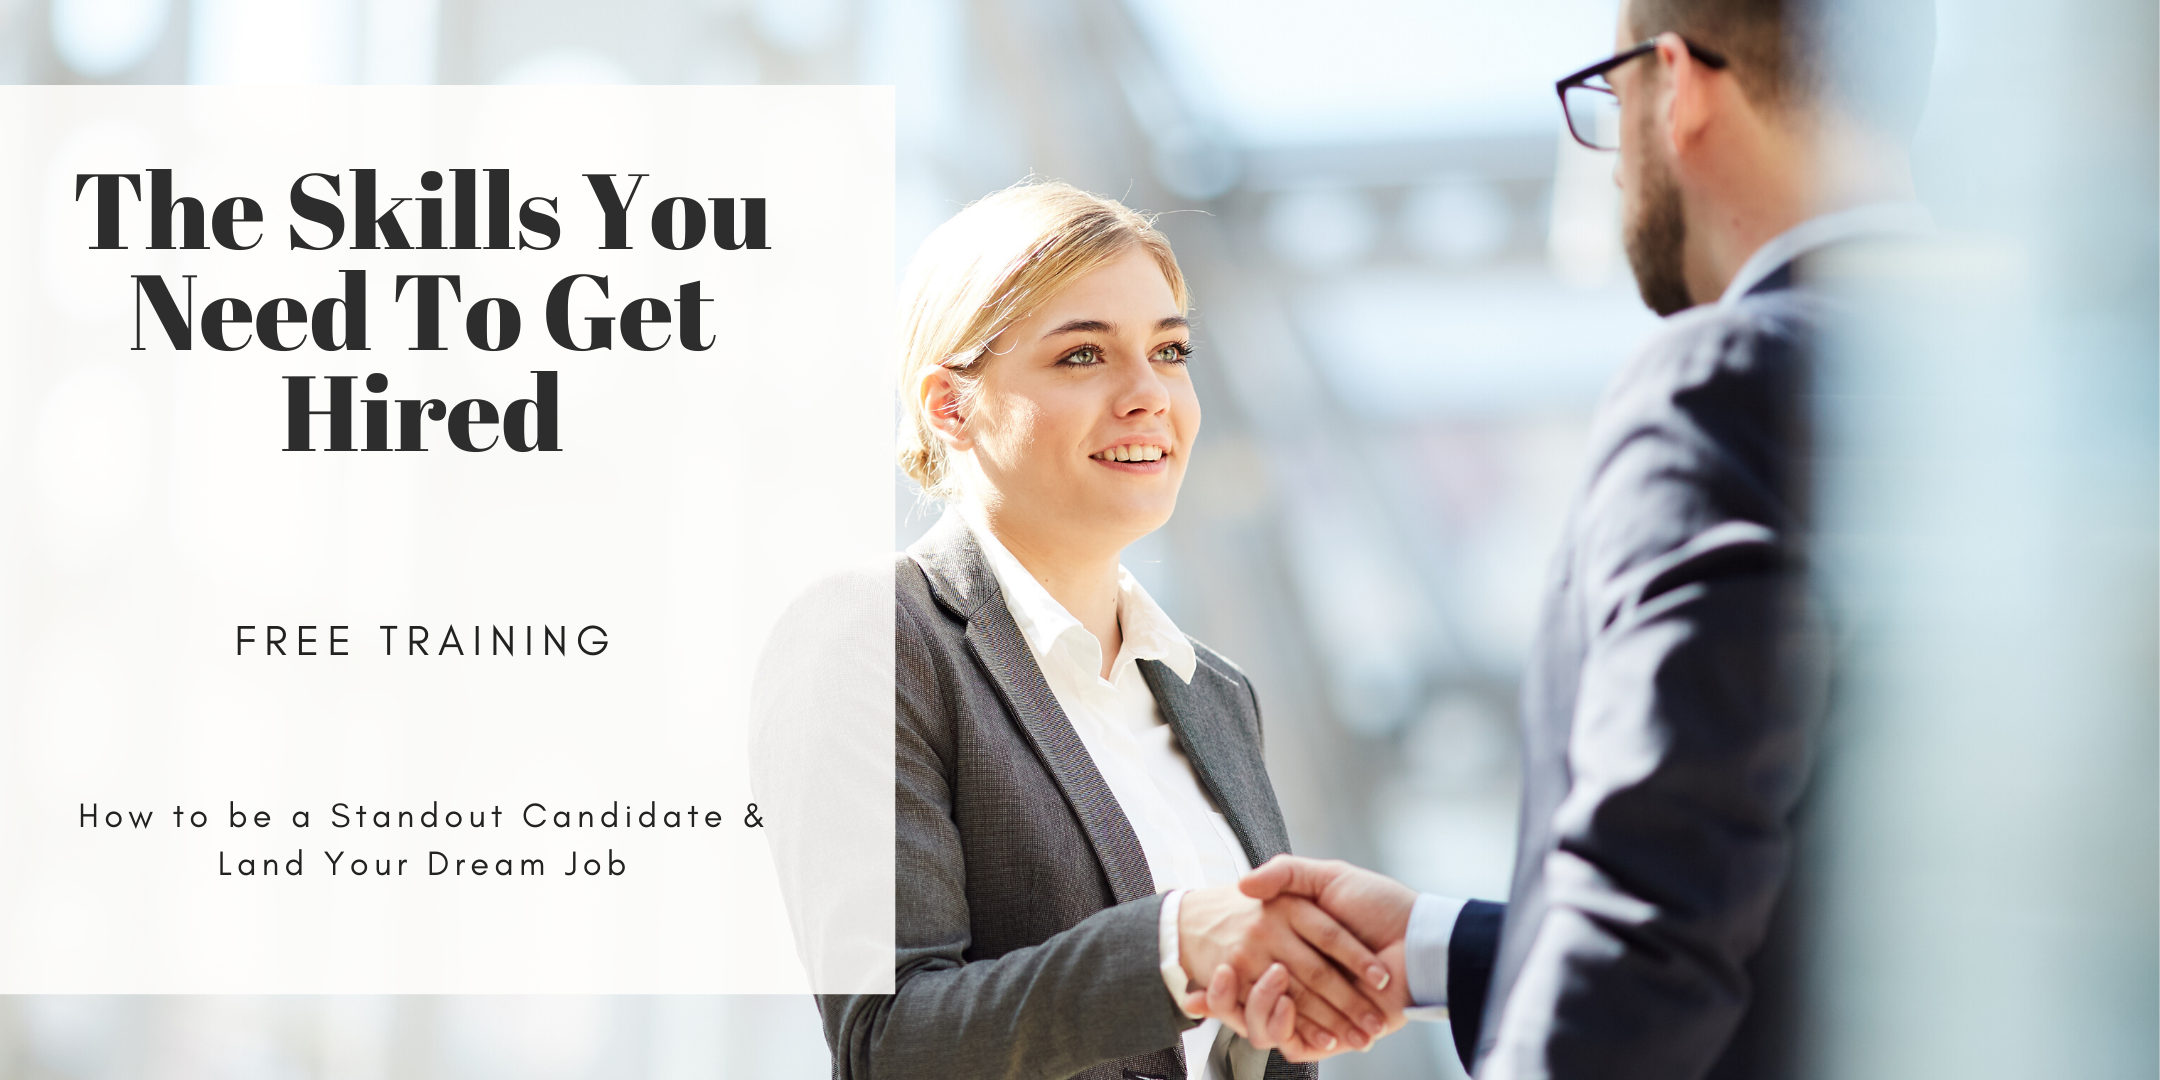 TRAINING: How to Land Your Dream Job (Career Workshop) McAllen, TX